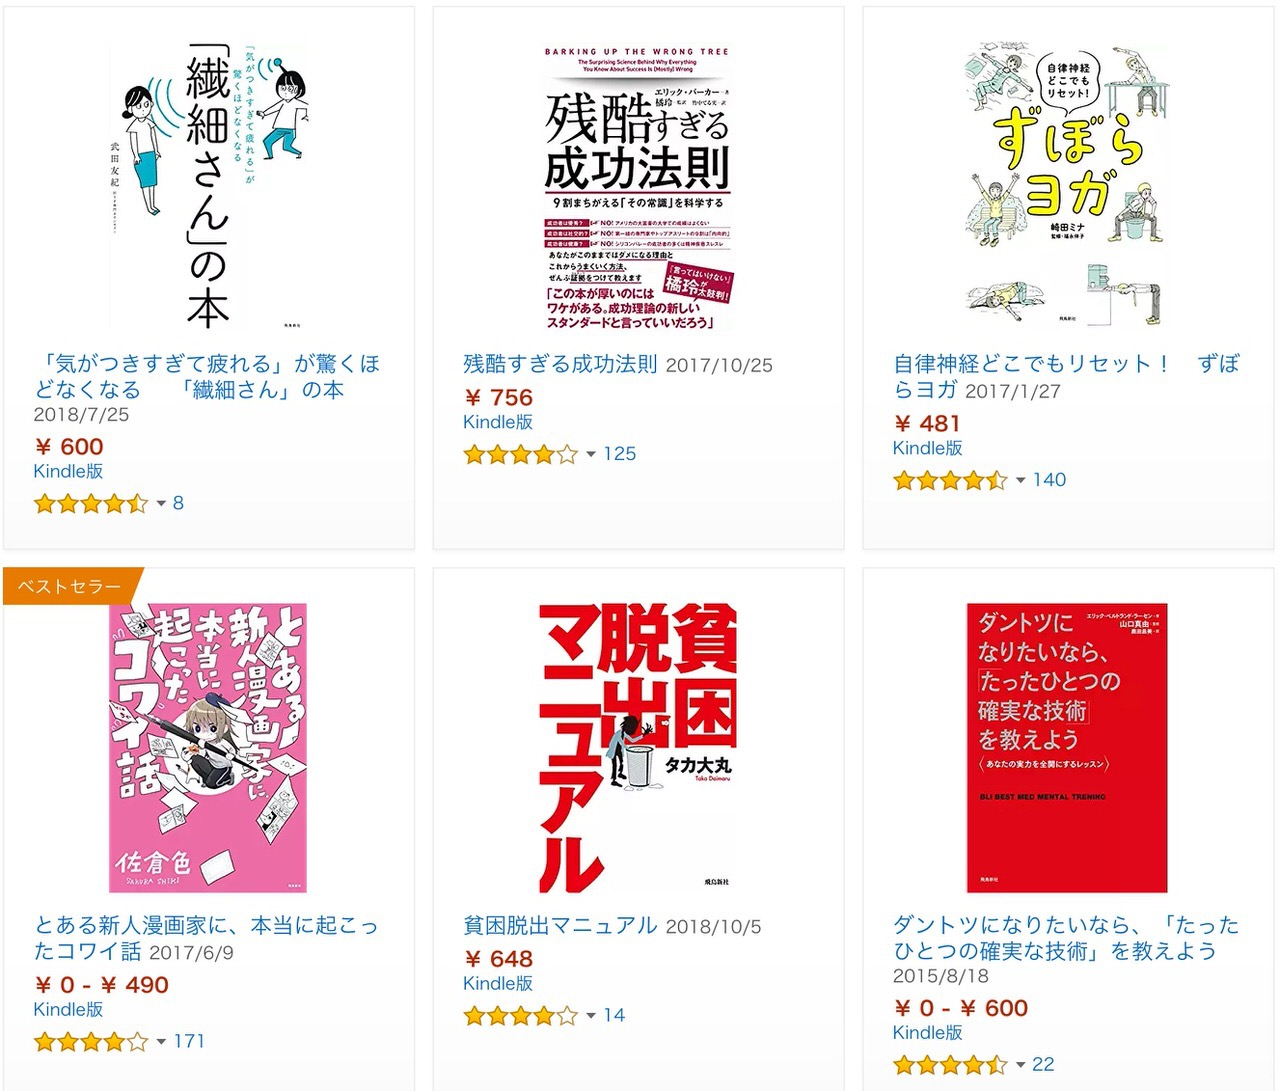 【Kindleセール】50%OFF「飛鳥新社200点以上セール」(11/8まで)